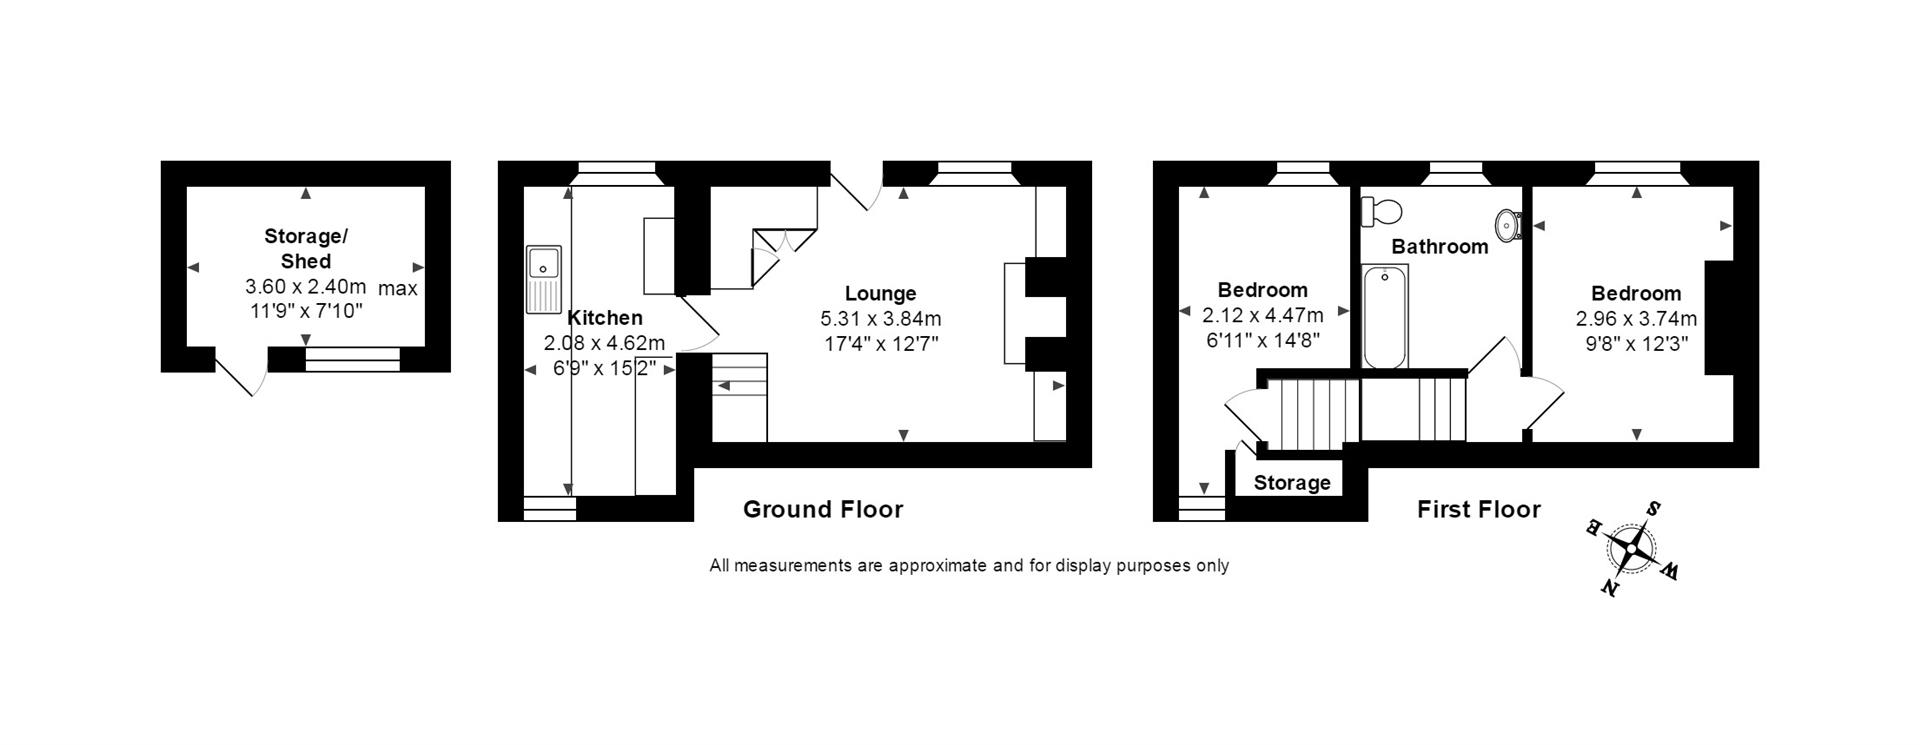 Clifden road st austell pl25 2 bedroom cottage for sale for 110 charles street east floor plan